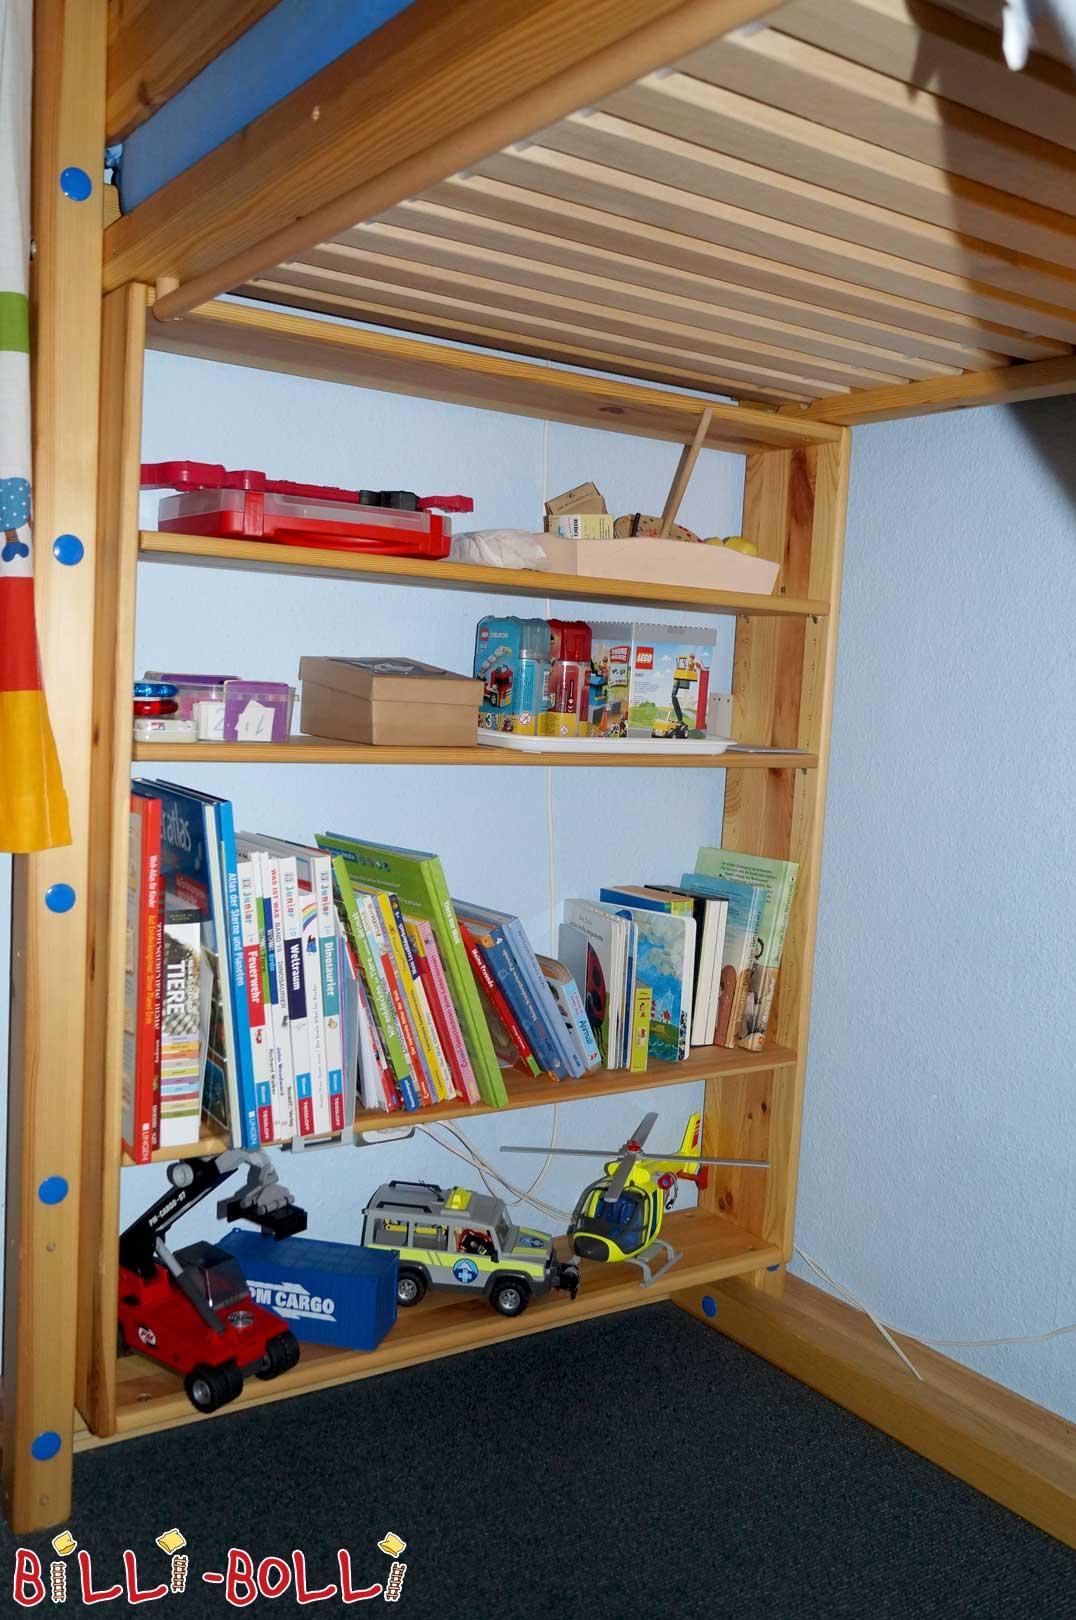 Accesorios | Muebles infantiles de Billi-Bolli